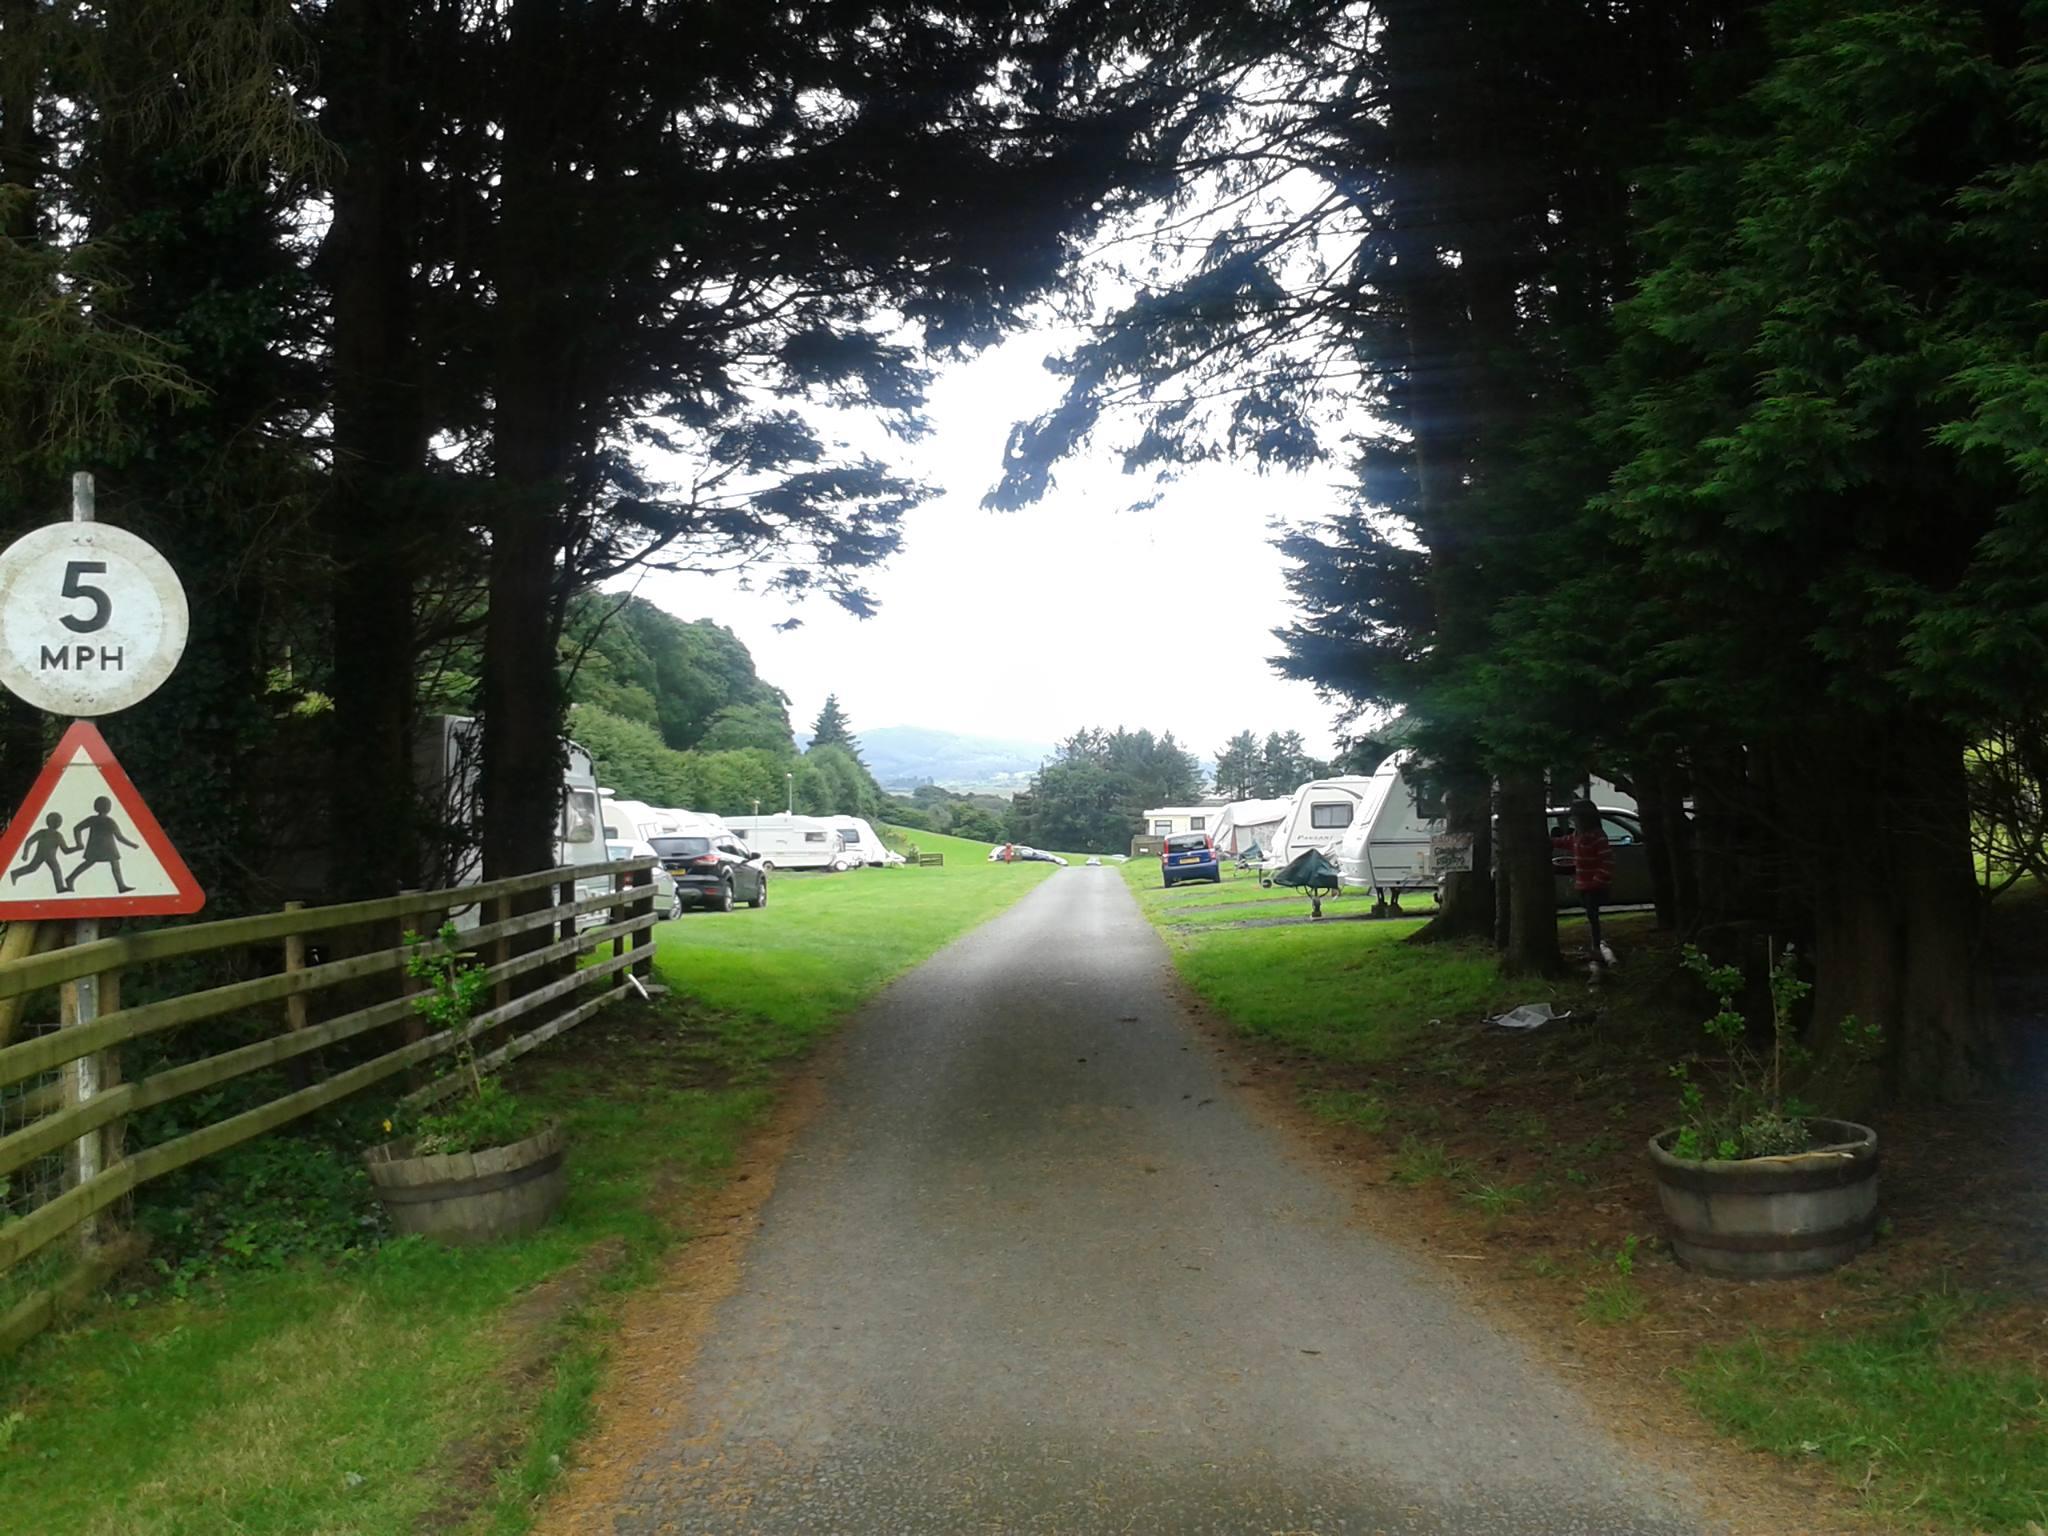 Cefn Crib Caravan entrance